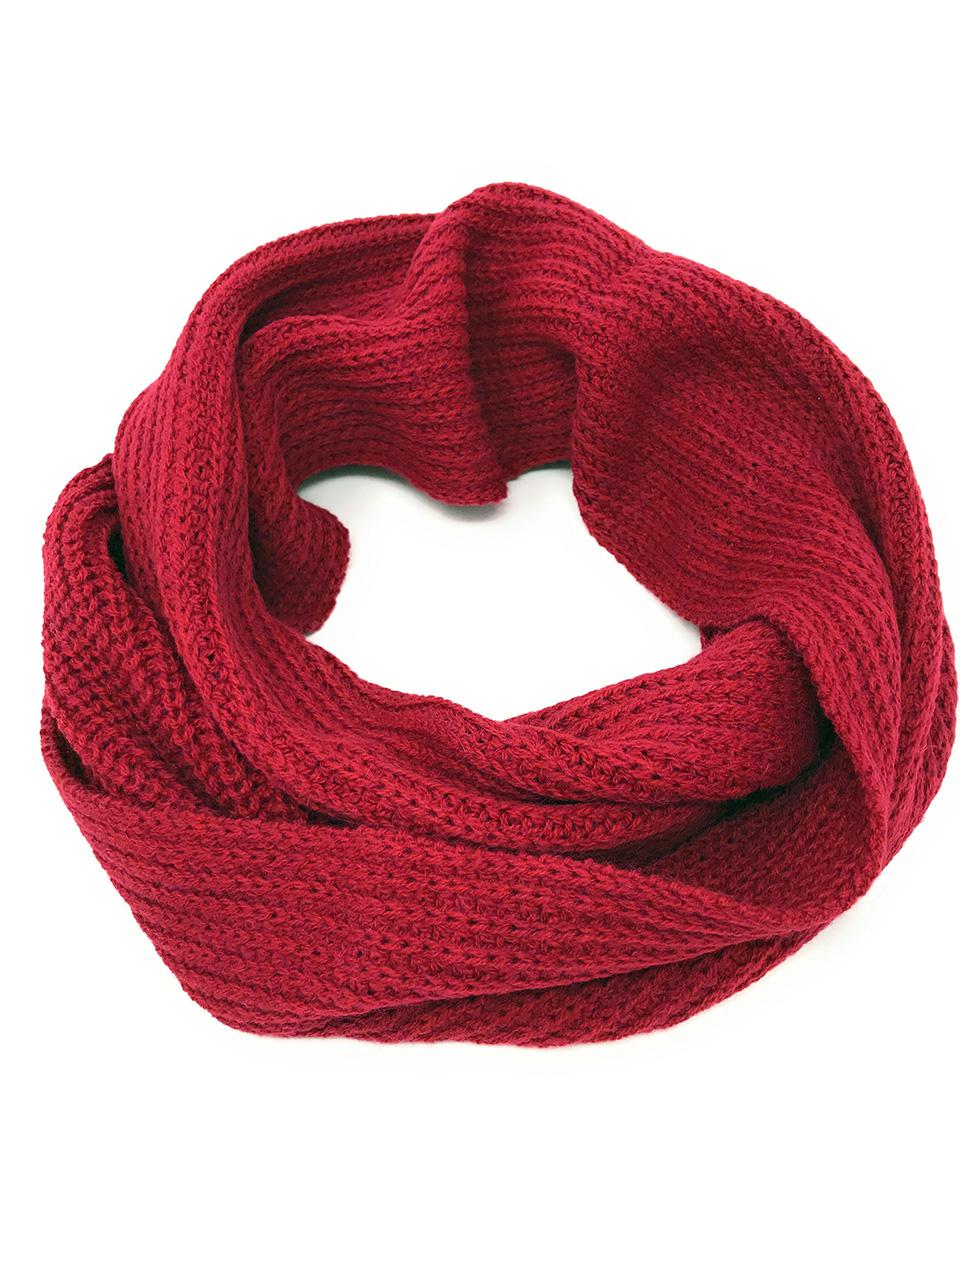 Hand Knit Infinity Circular Scarf / Snood - Alpaca Wool & Acrylic Snood only